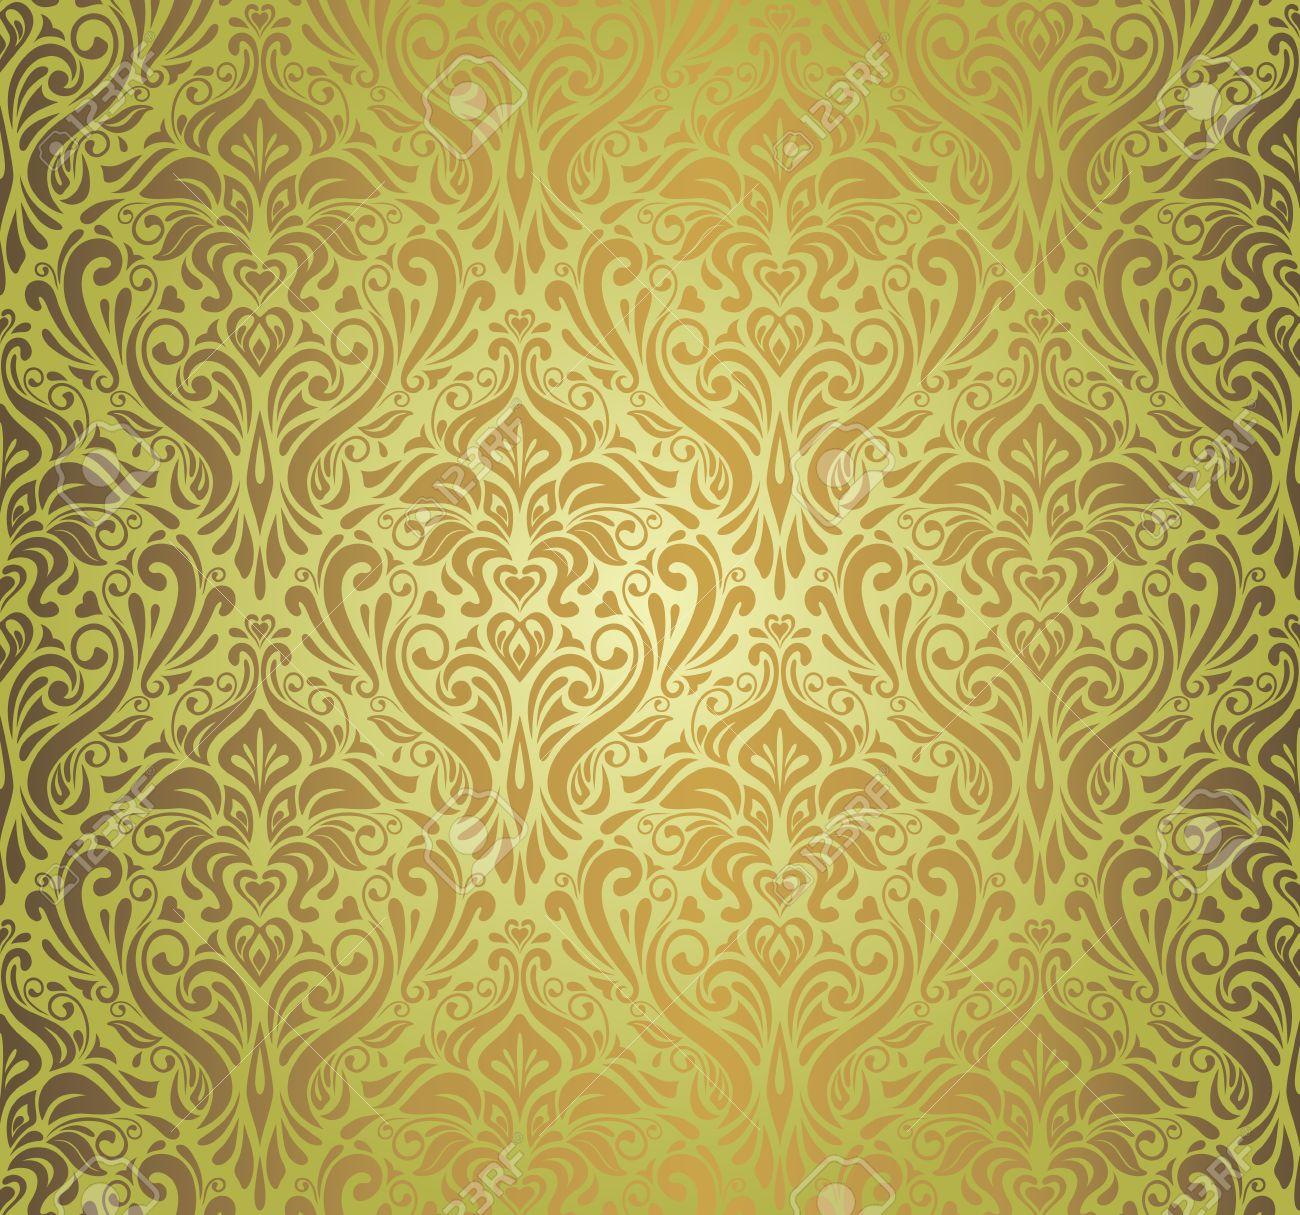 green brown vintage wallpaper design royalty free cliparts, vectors